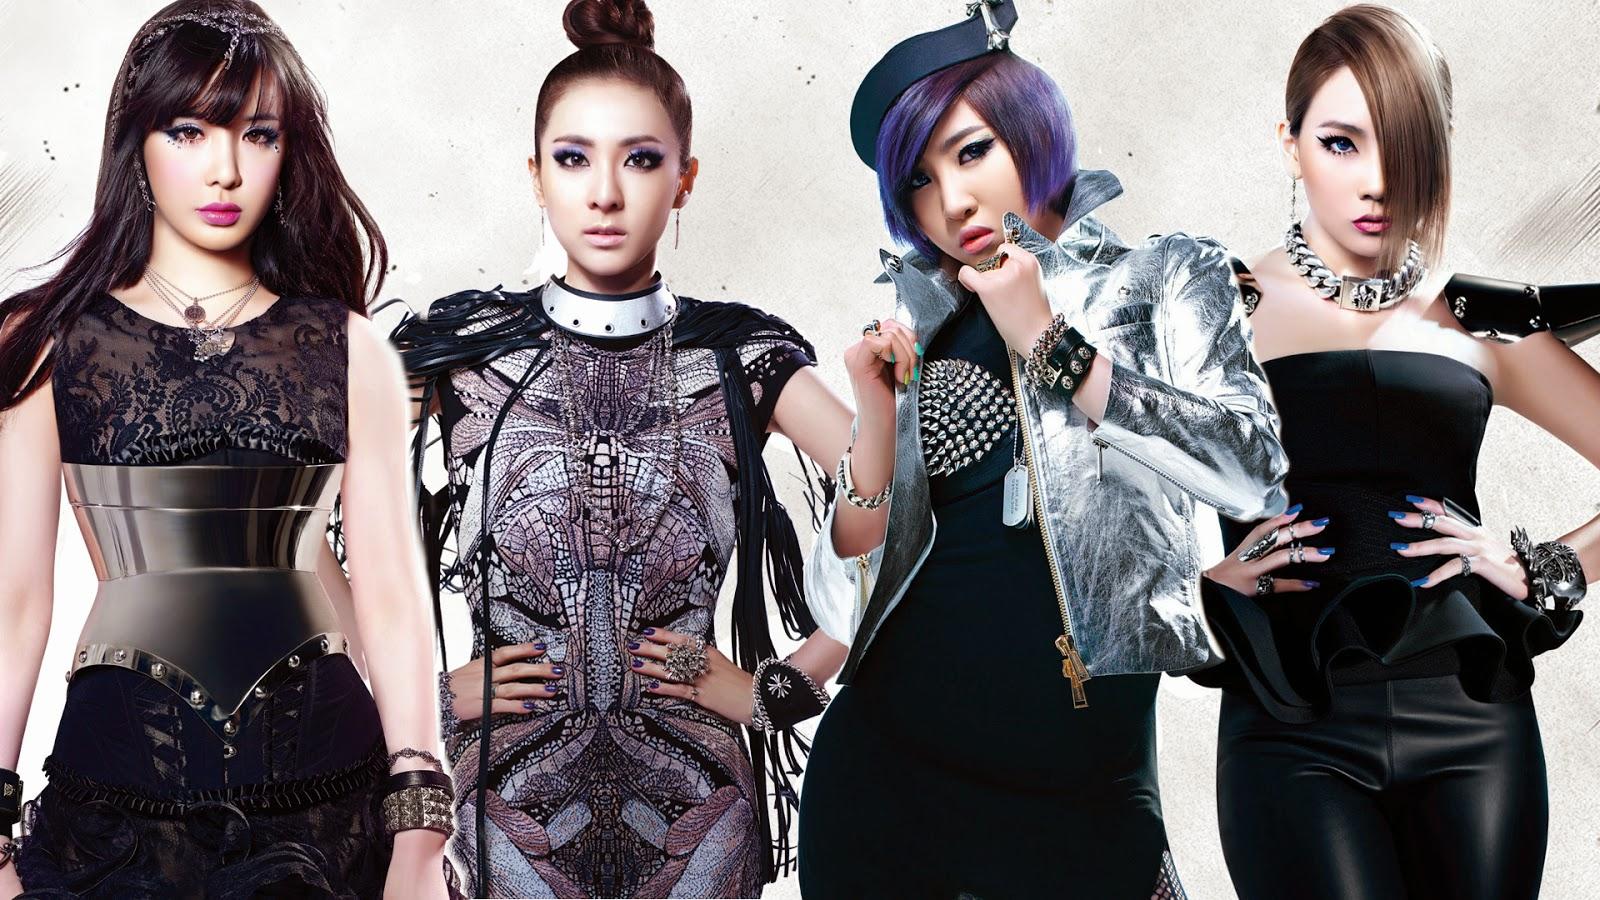 2NE1 Wallpaper HD 2014 Come Back Home - Free Kpop ...